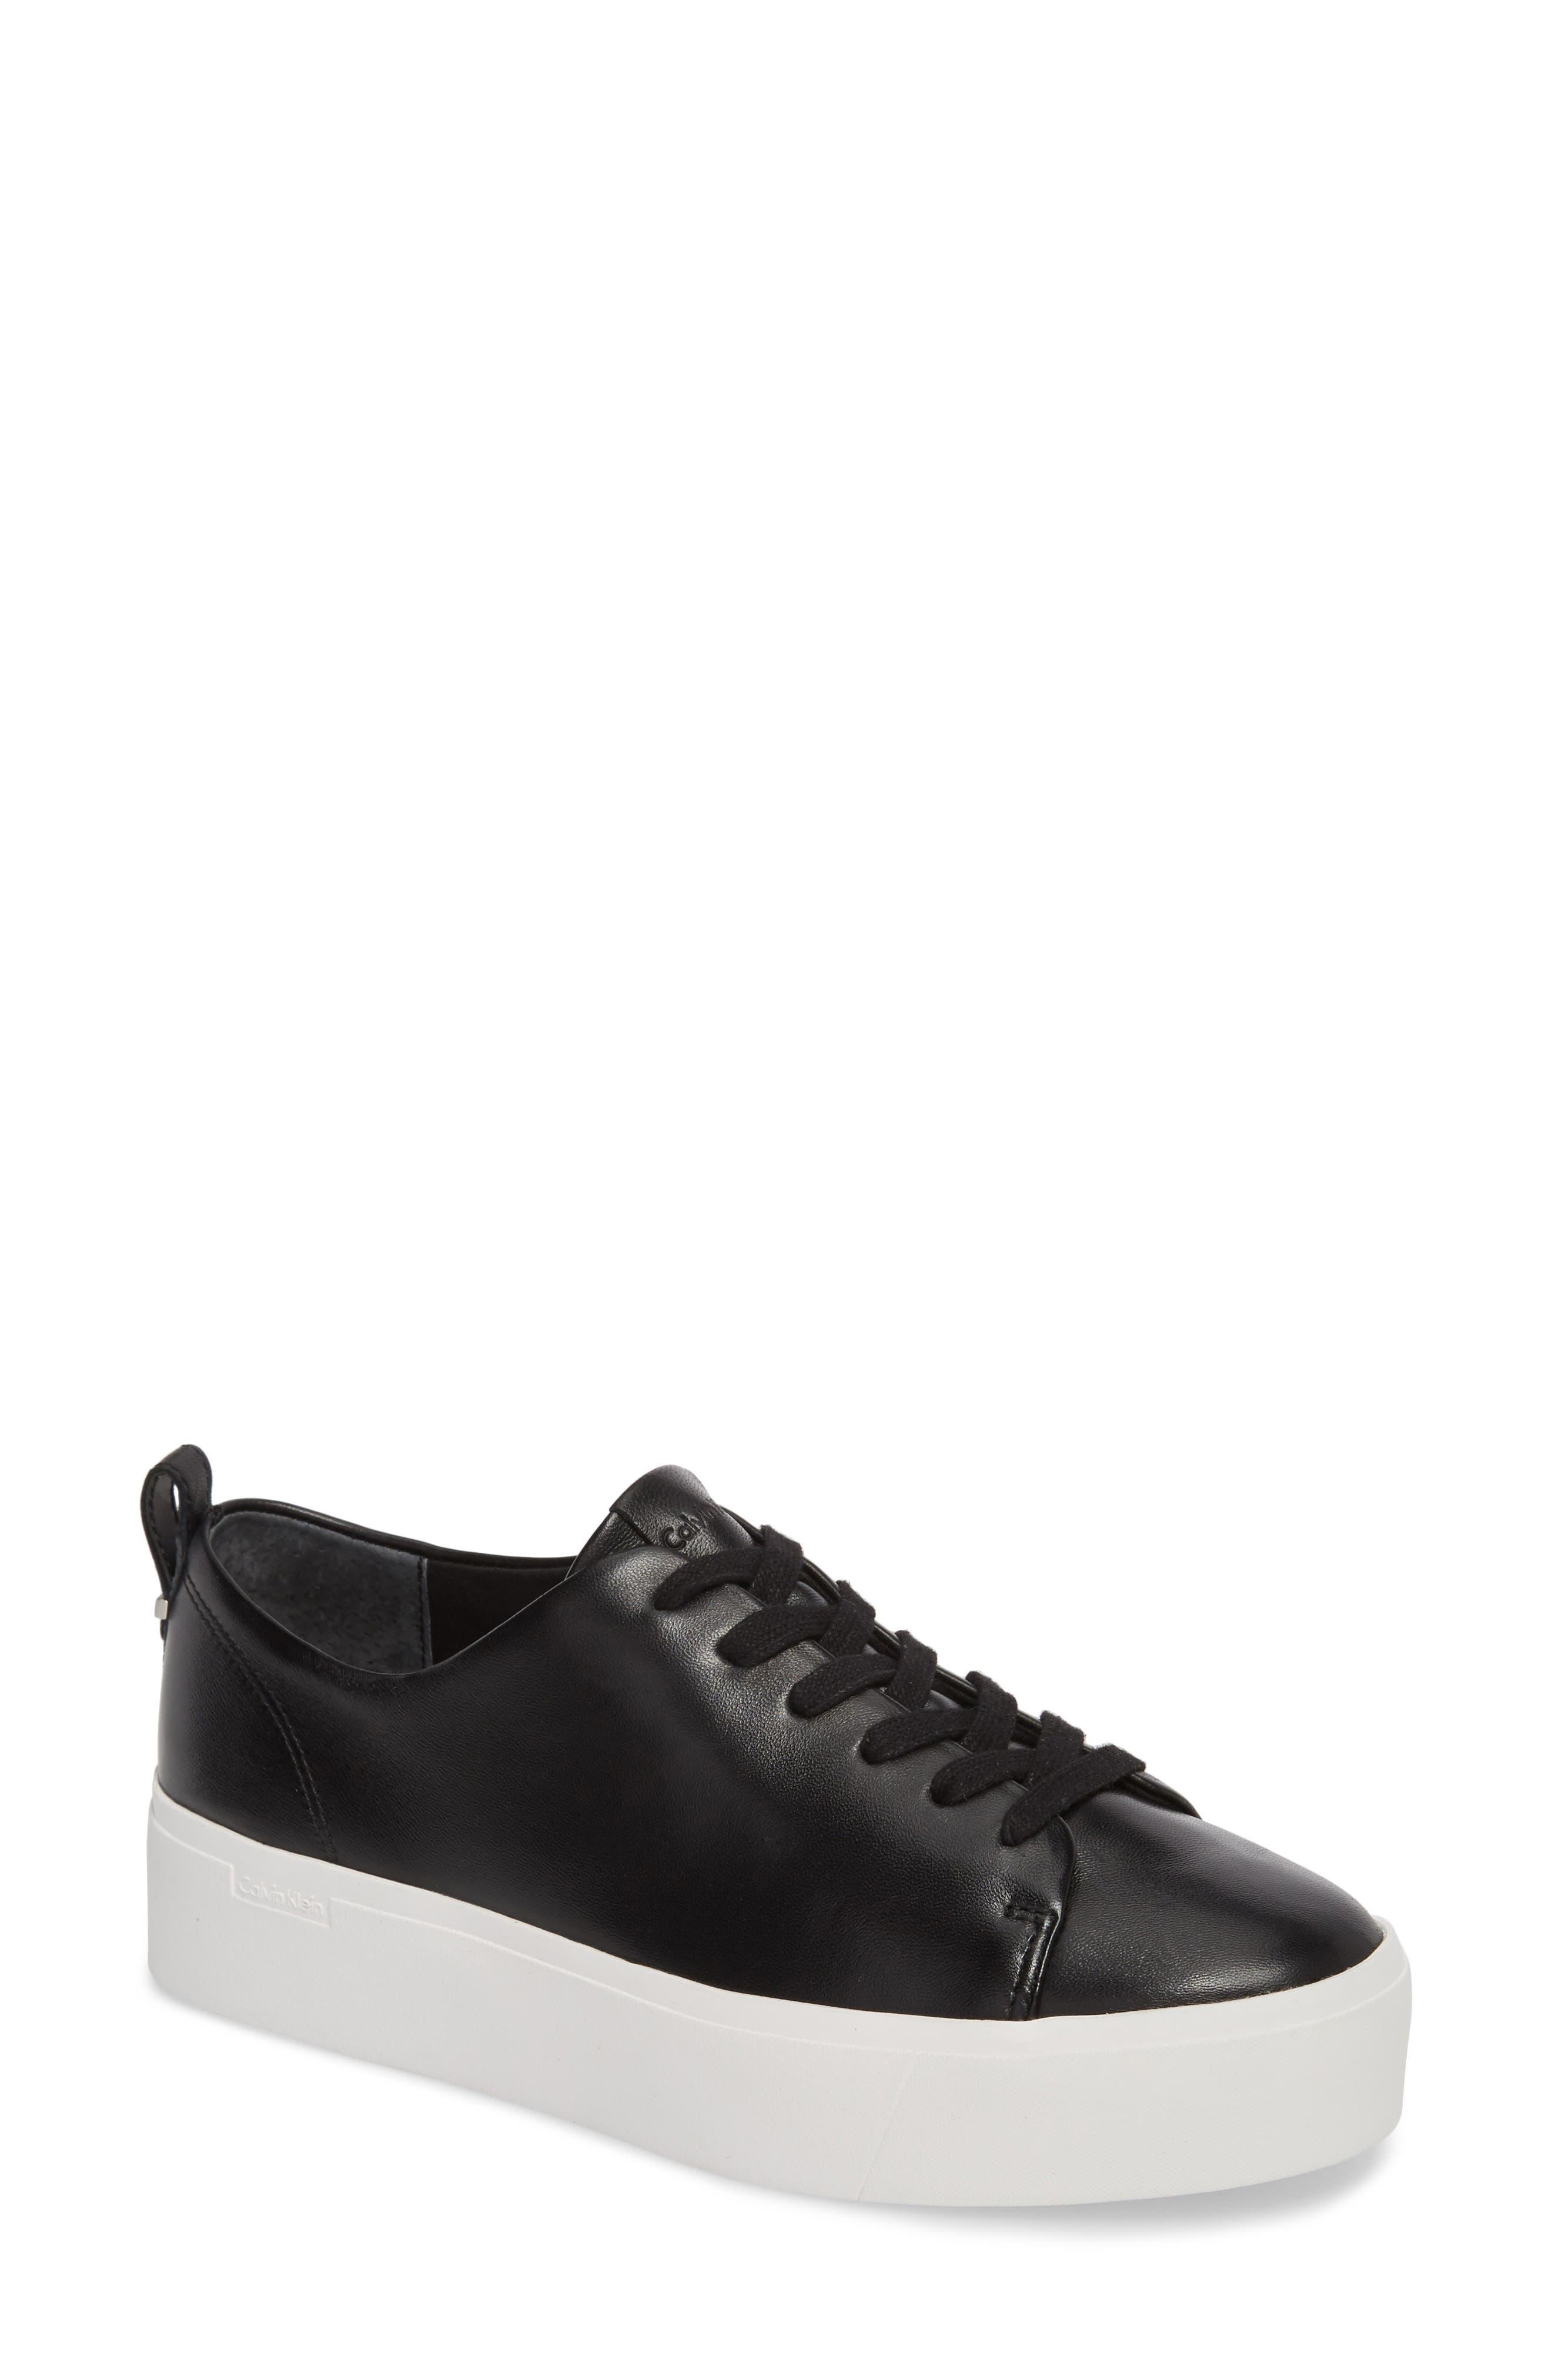 Janet Platform Sneaker,                         Main,                         color,